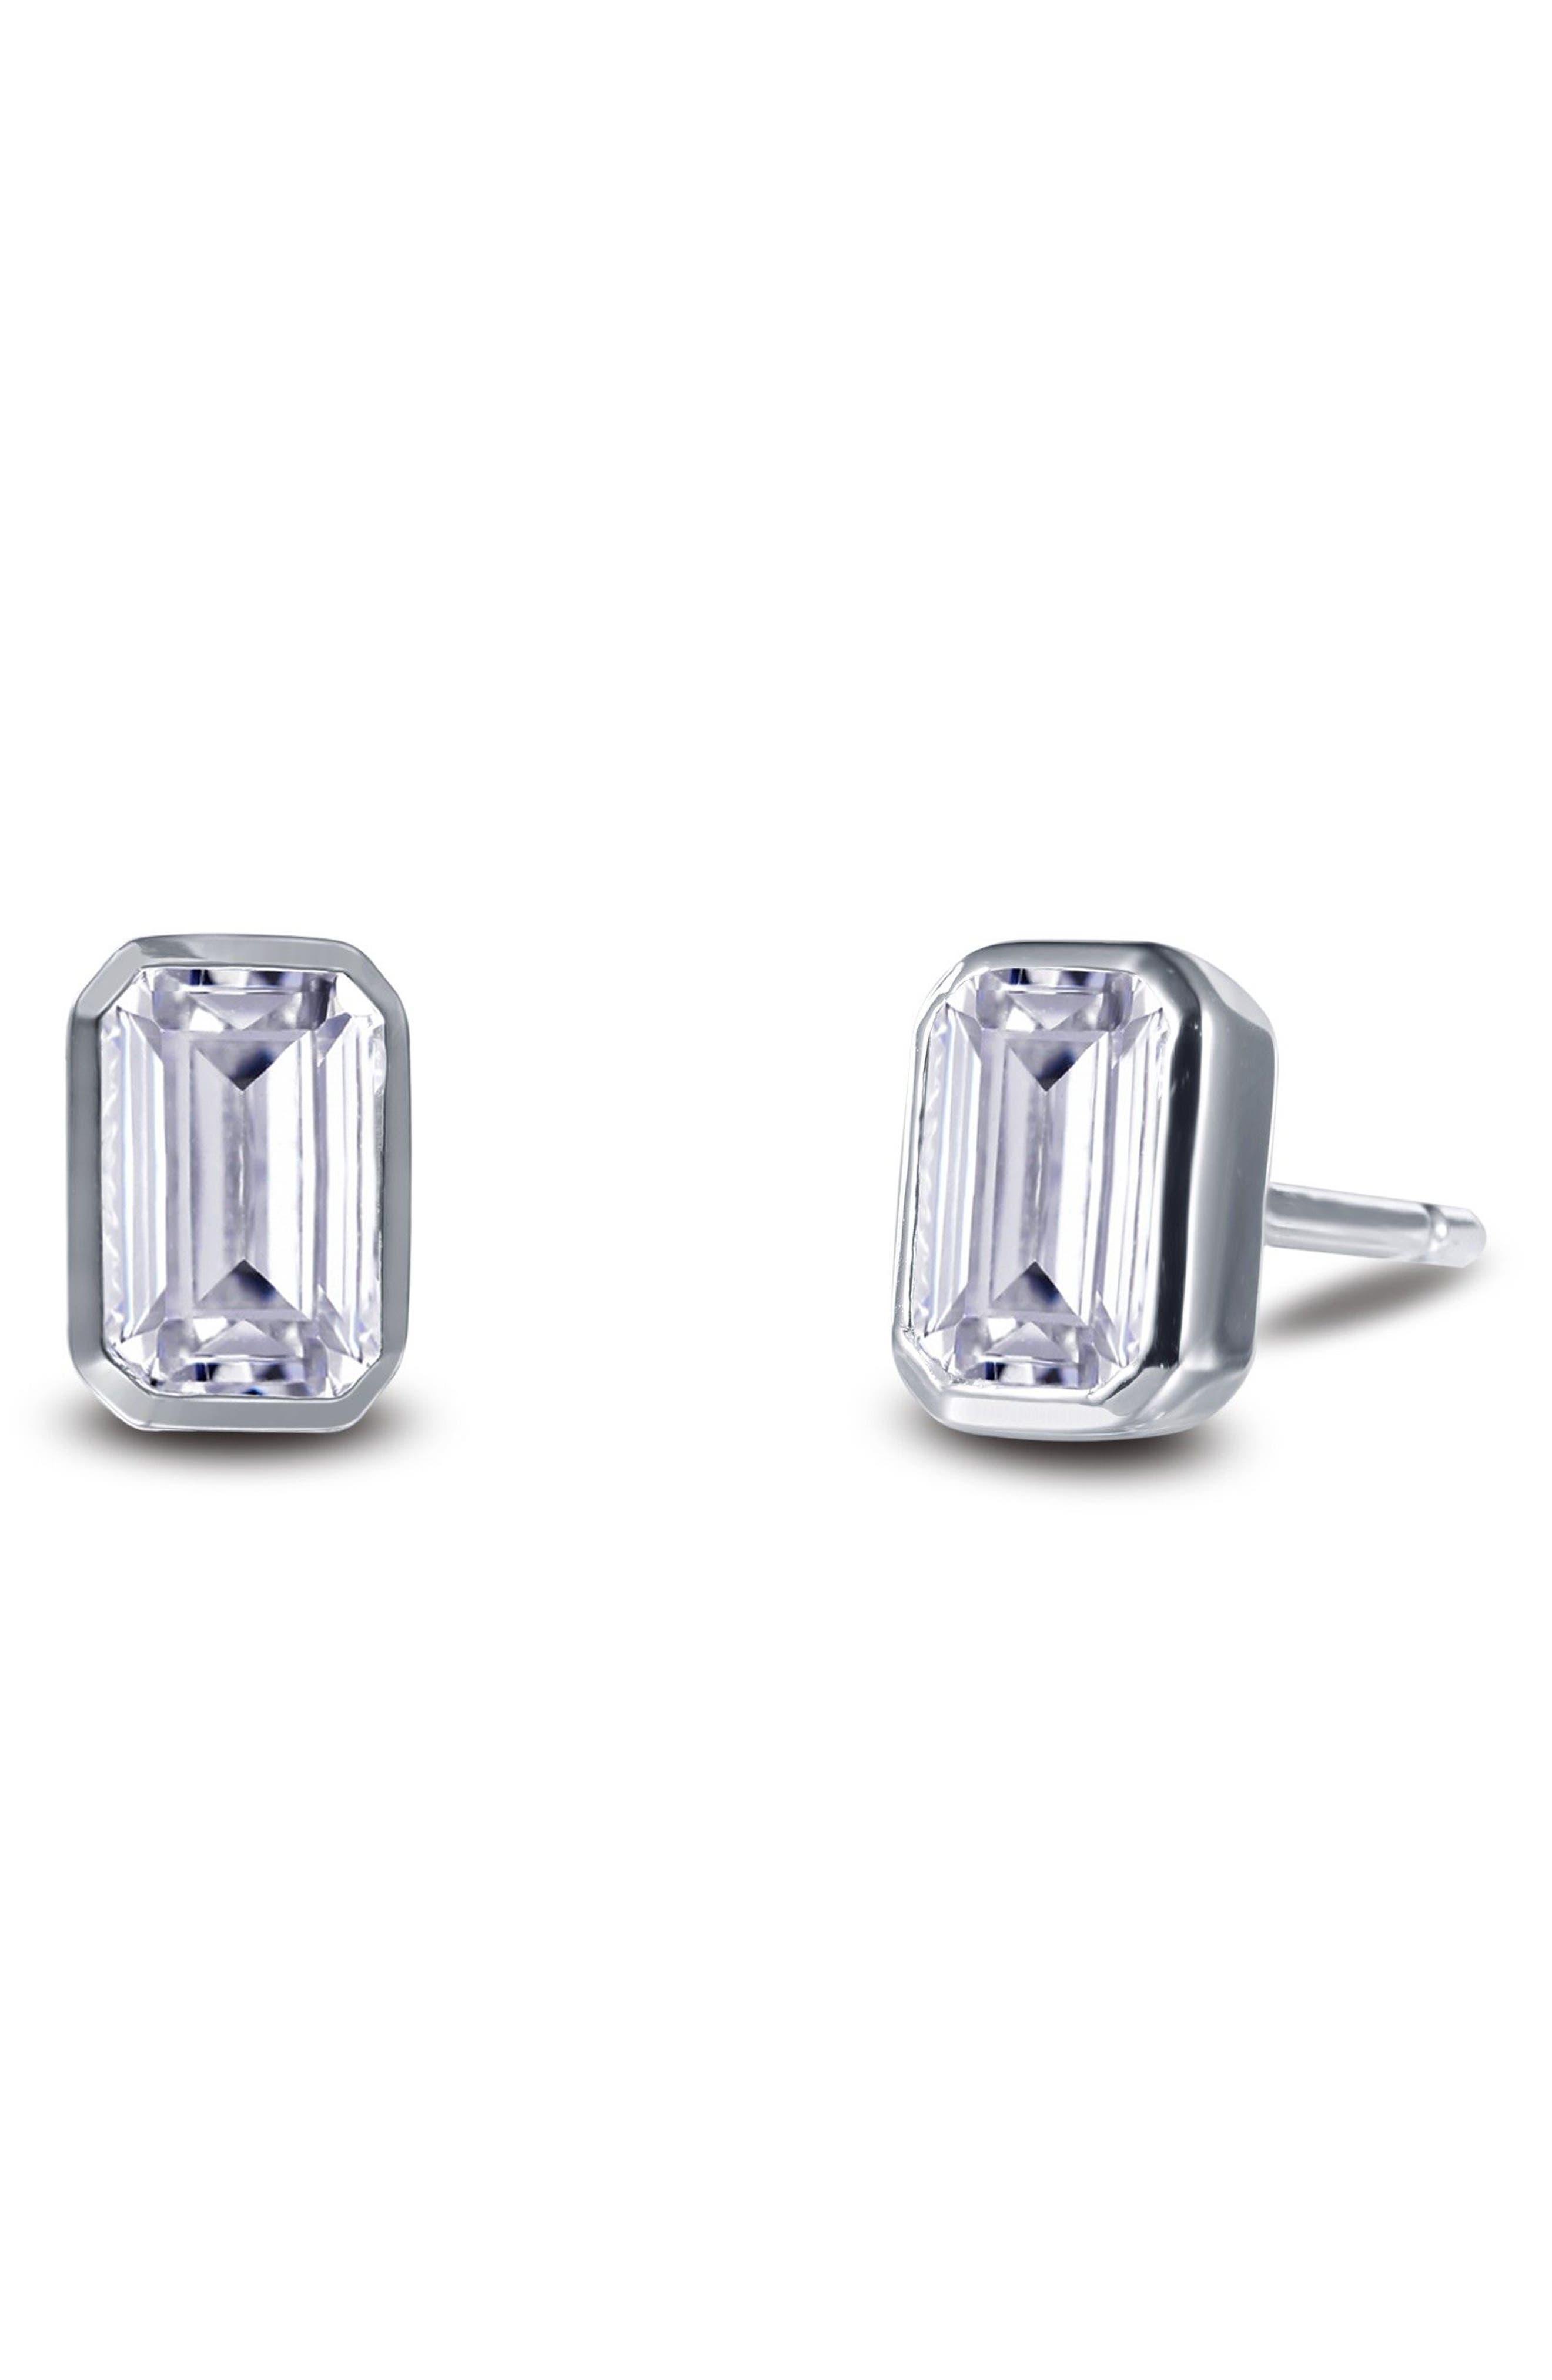 Bezel-Set Emerald Cut Stud Earrings,                             Alternate thumbnail 3, color,                             Silver/ Clear